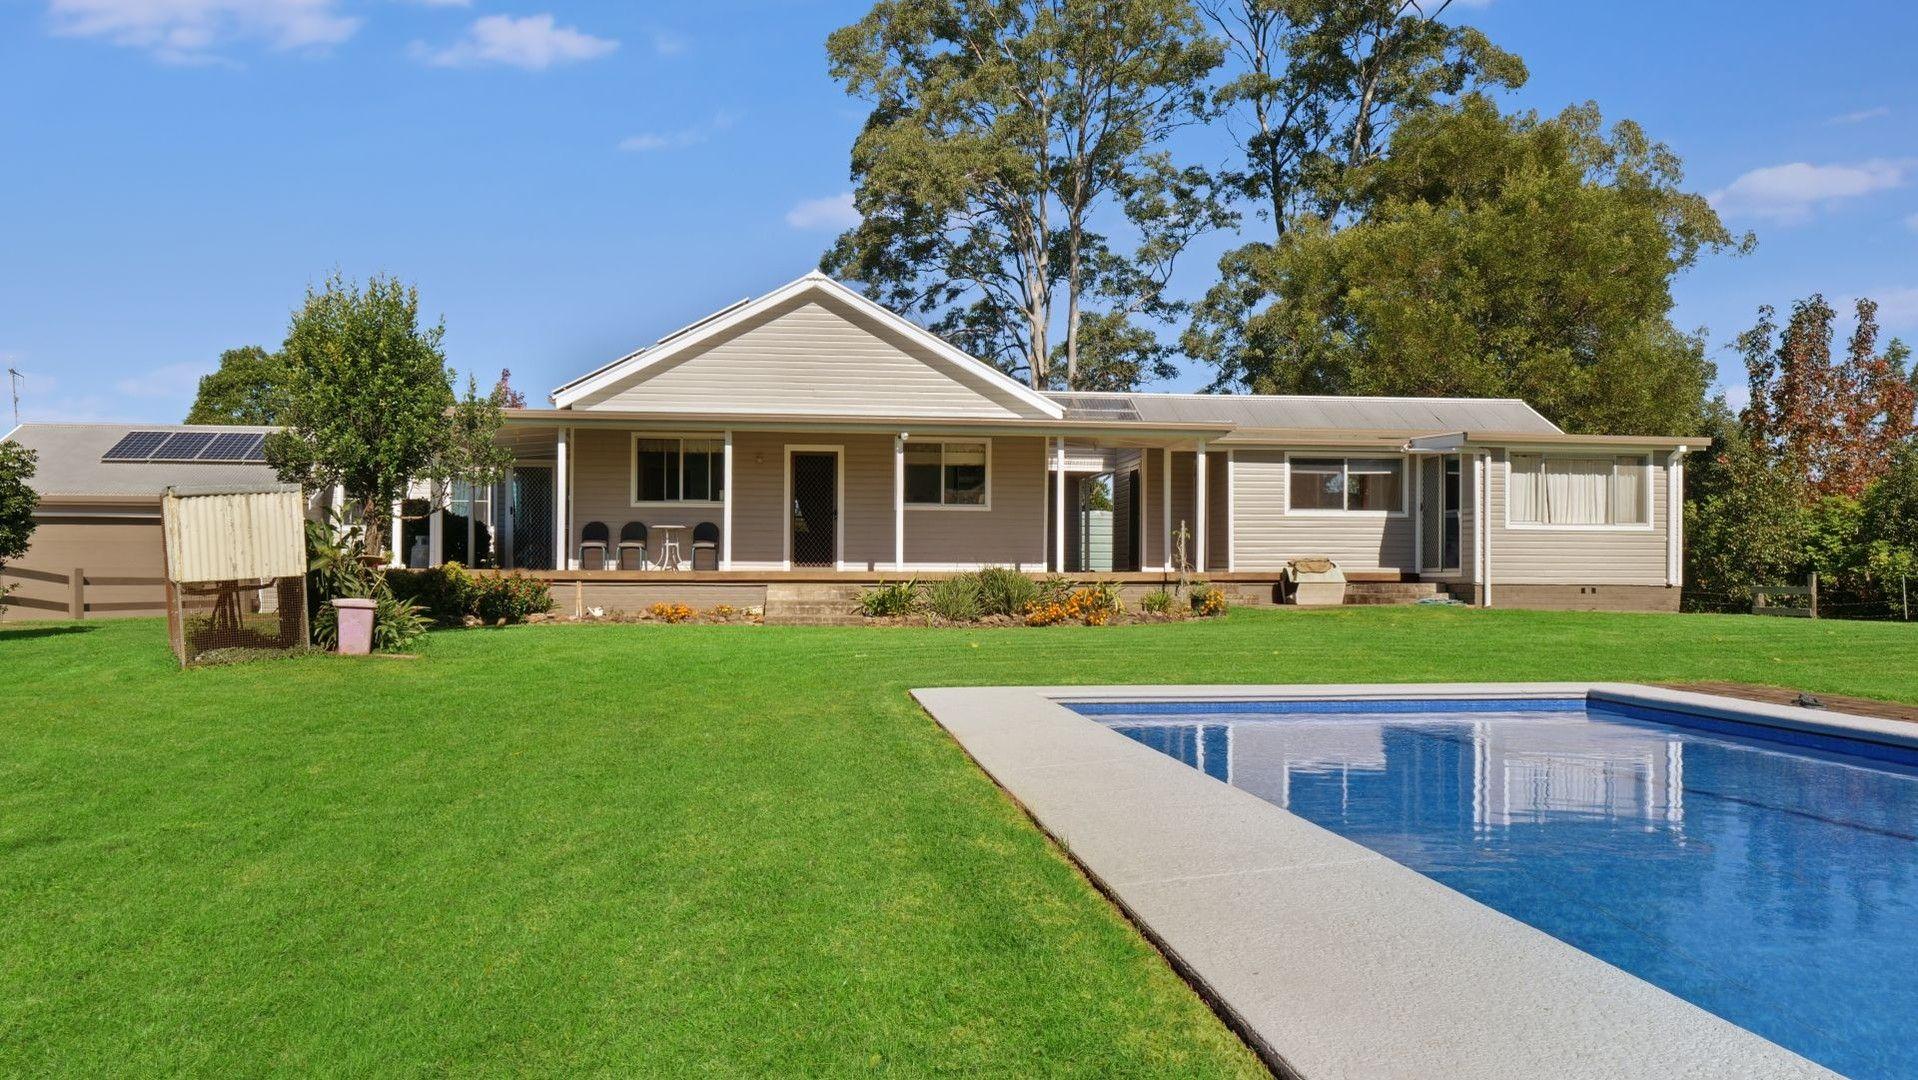 192 Bril Bril Road, Rollands Plains NSW 2441, Image 1